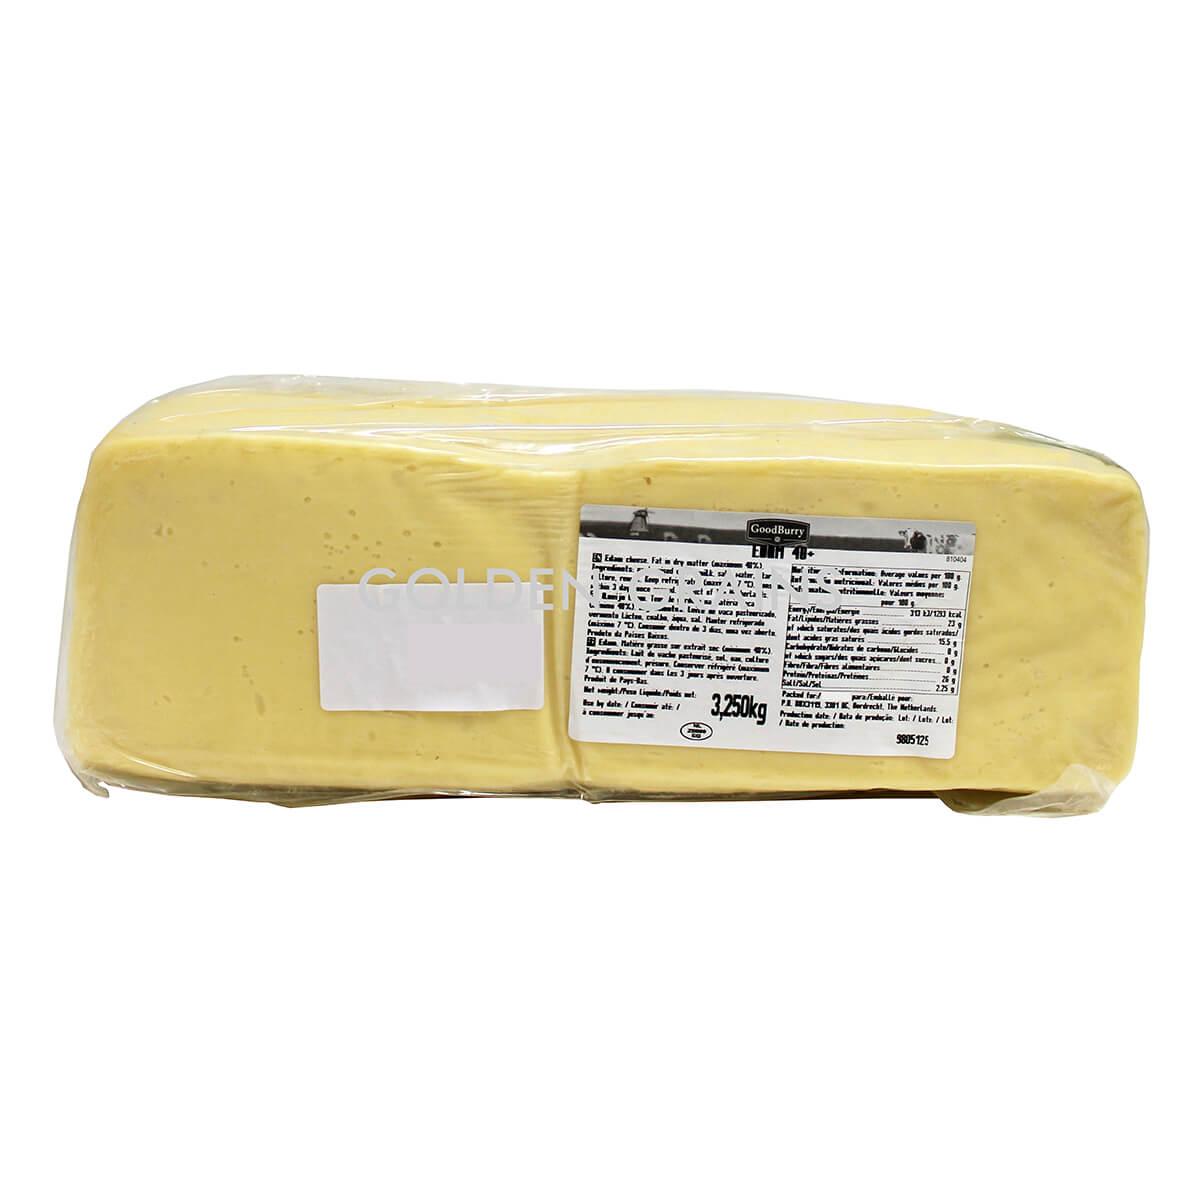 Goodbury Edam Cheese Loaf